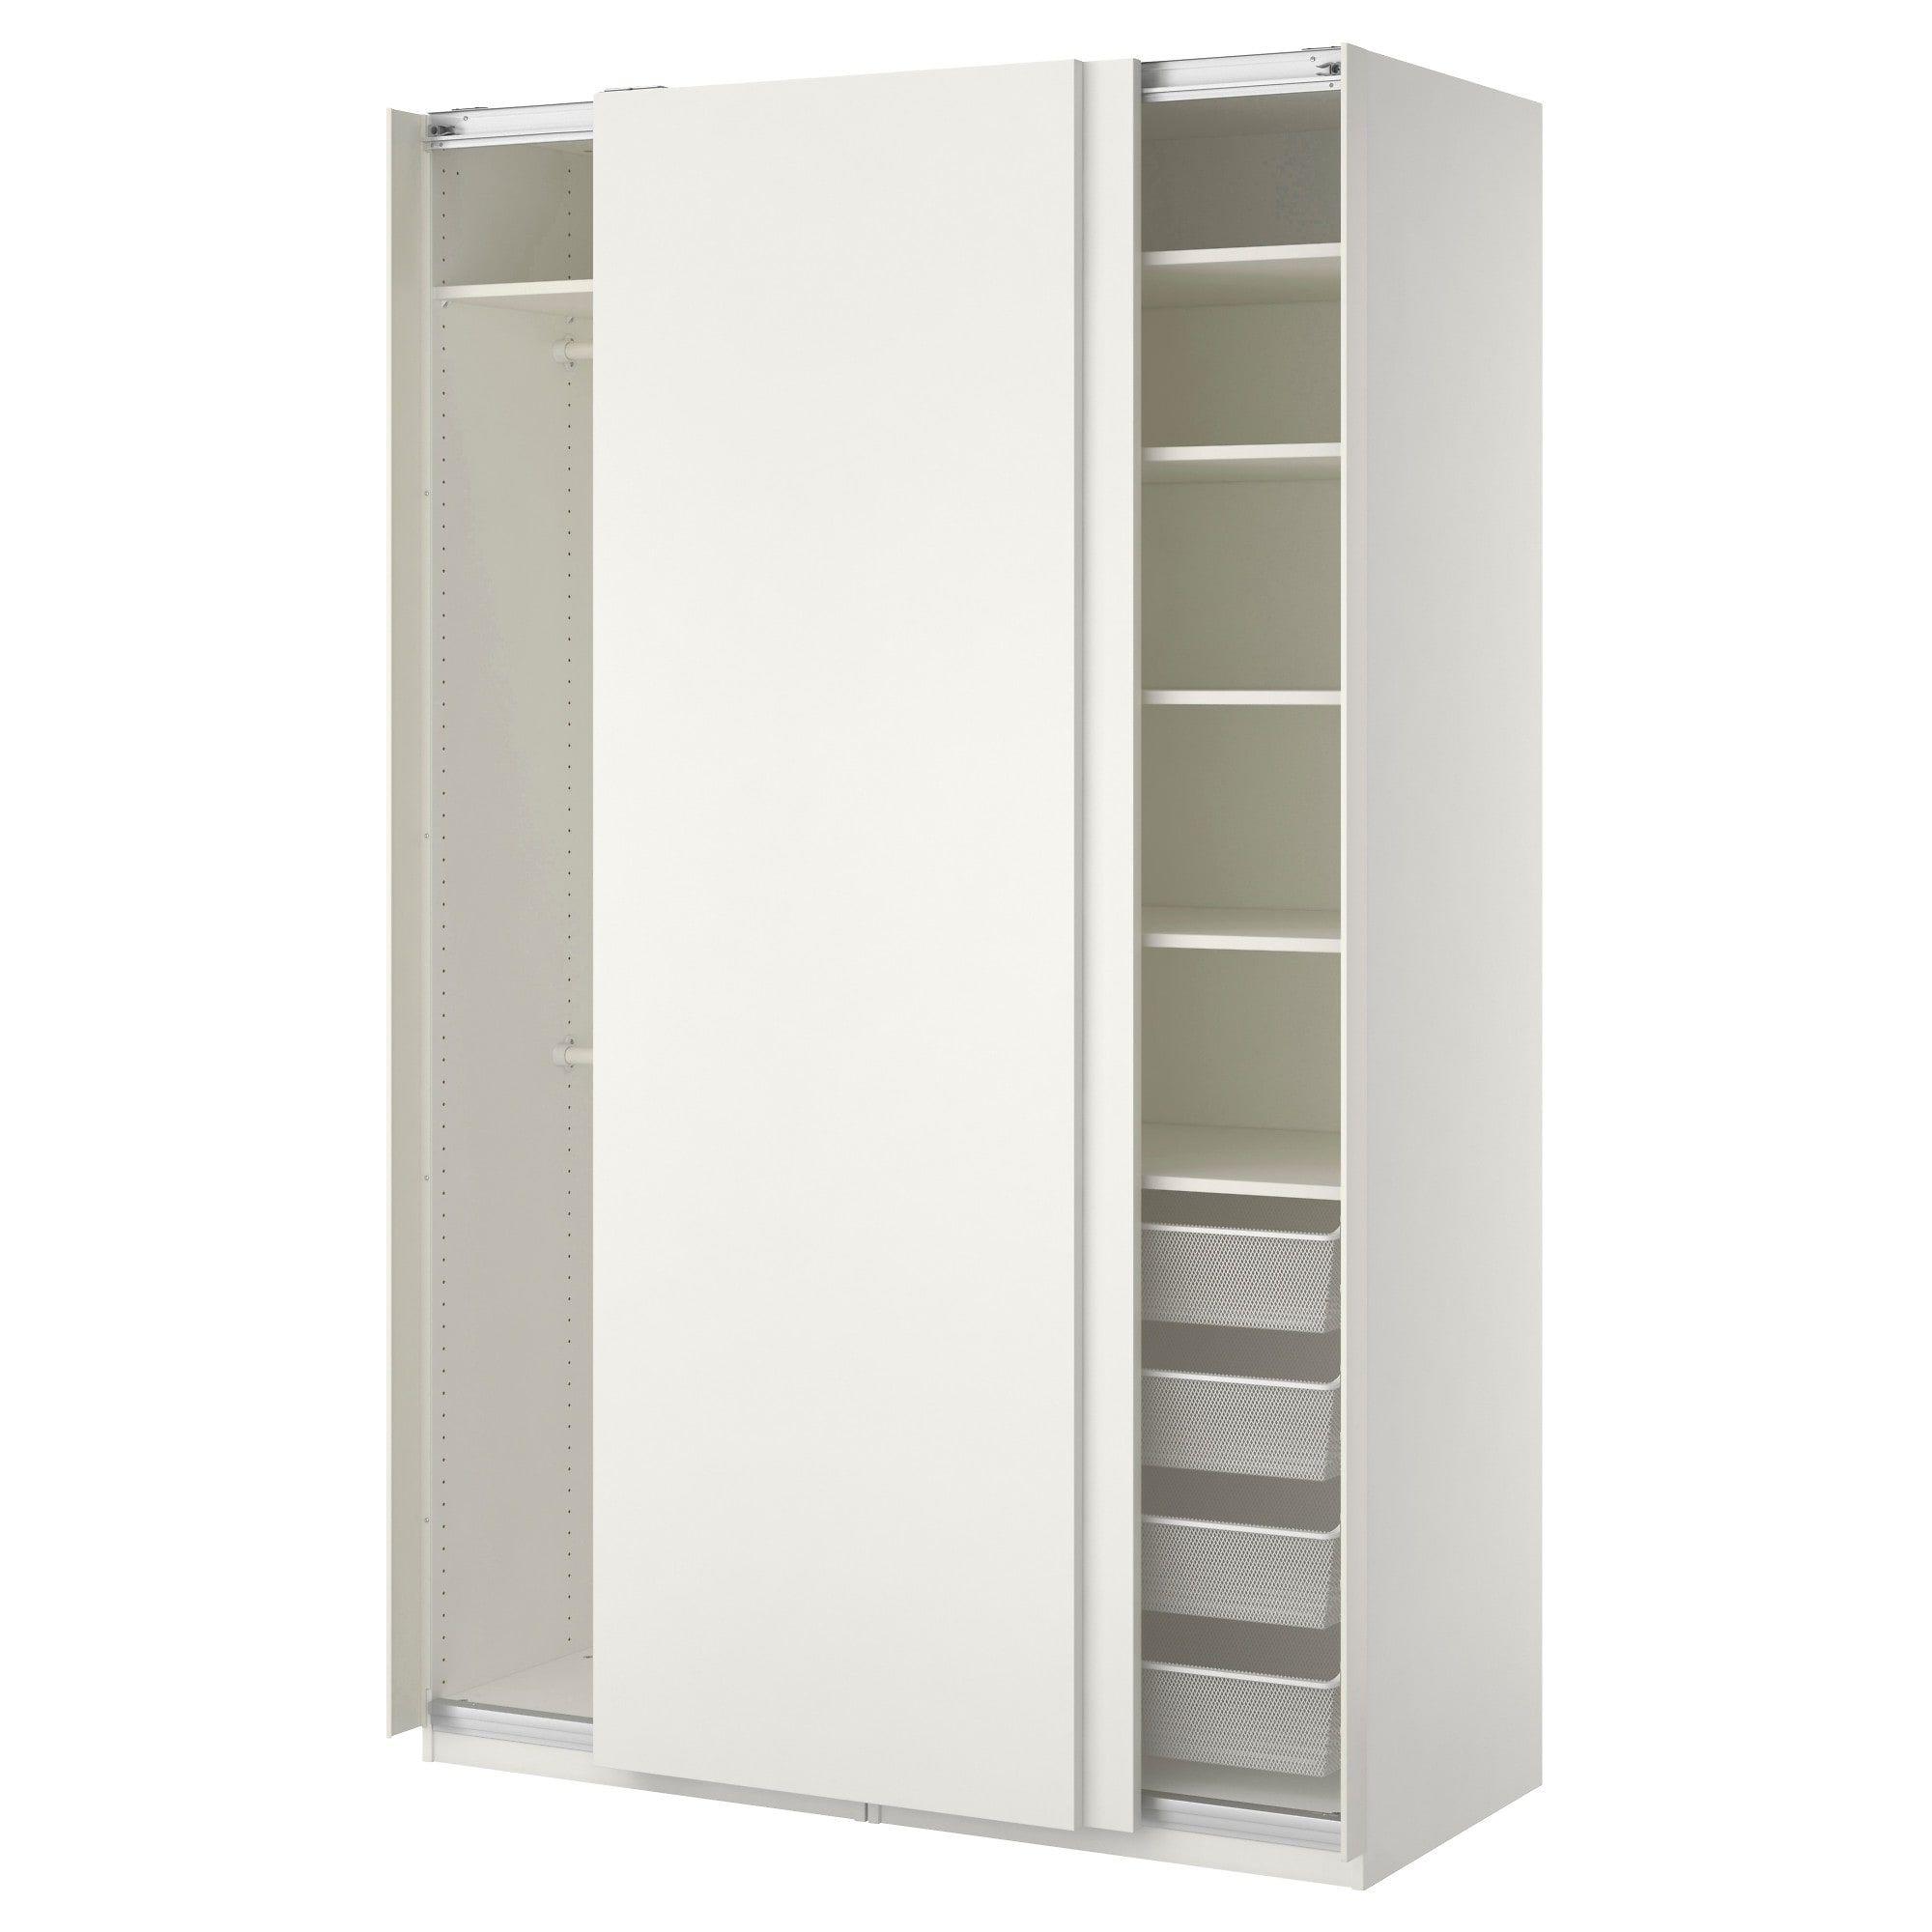 Scarpiera Guardaroba Pax Ikea.Pax Guardaroba Bianco Hasvik Bianco 150x66x236 Cm Ottieni